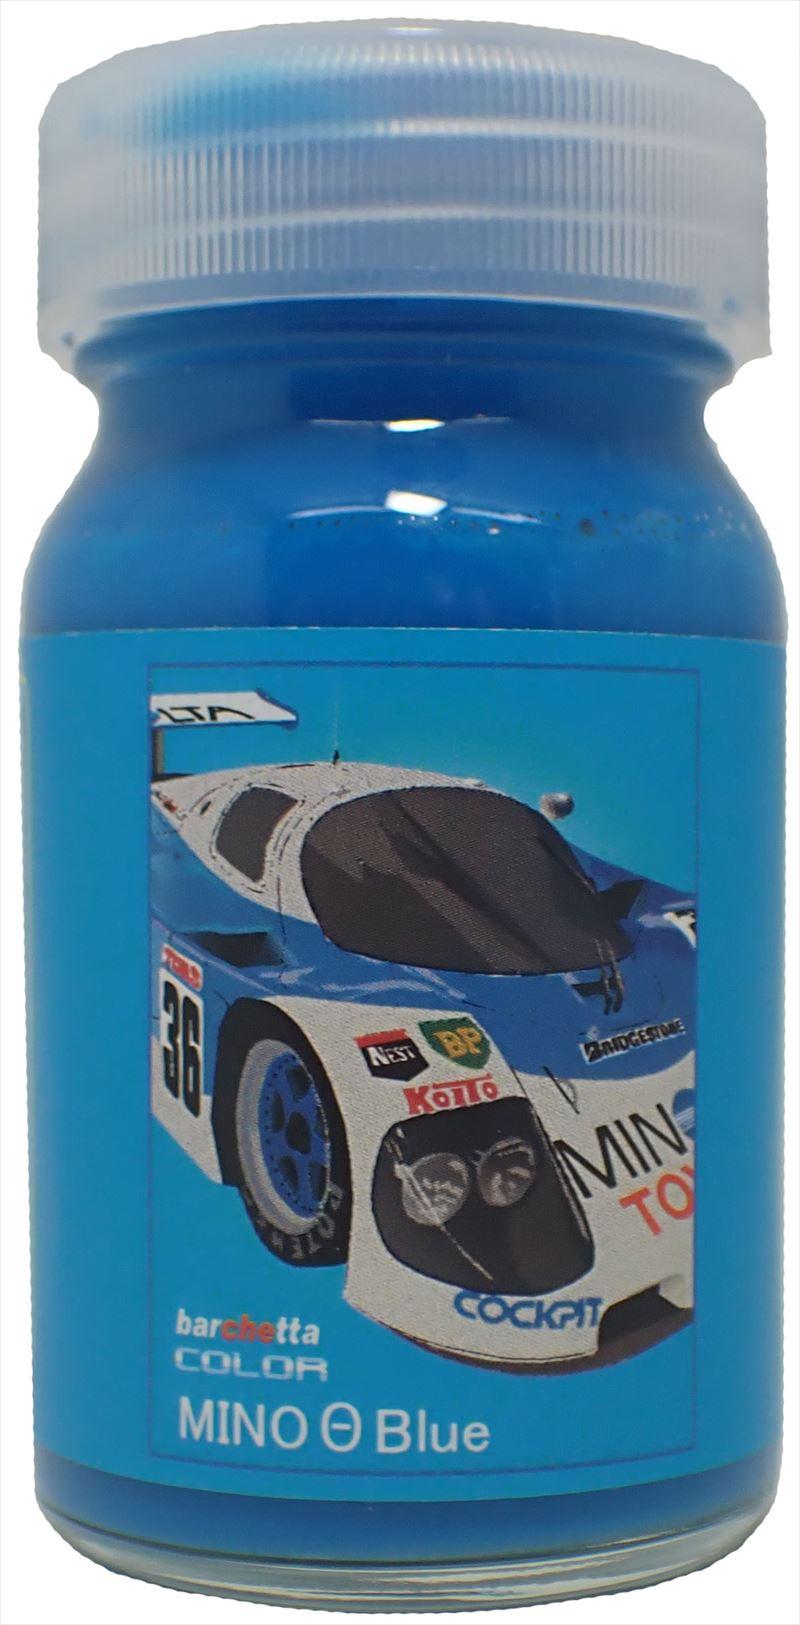 bc047 MINOΘBlue  大瓶50ml